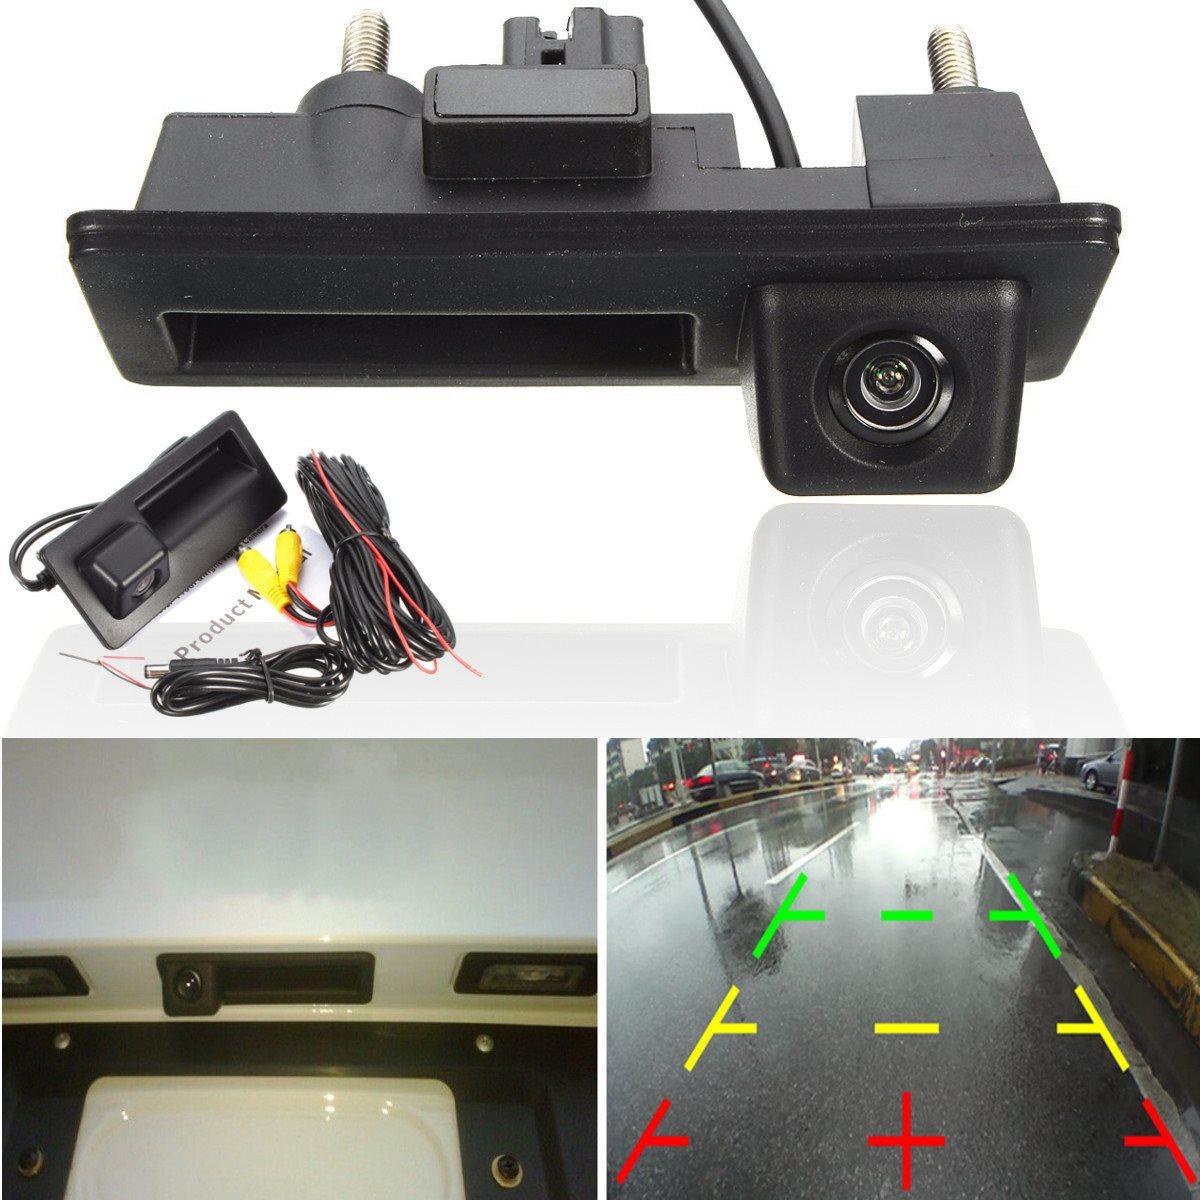 Car Rear View Cameras Reversing Reverse Camera For VW /GOLF /JETTA /TIGUAN /RCD510 /RNS315 /RNS310 /RNS510